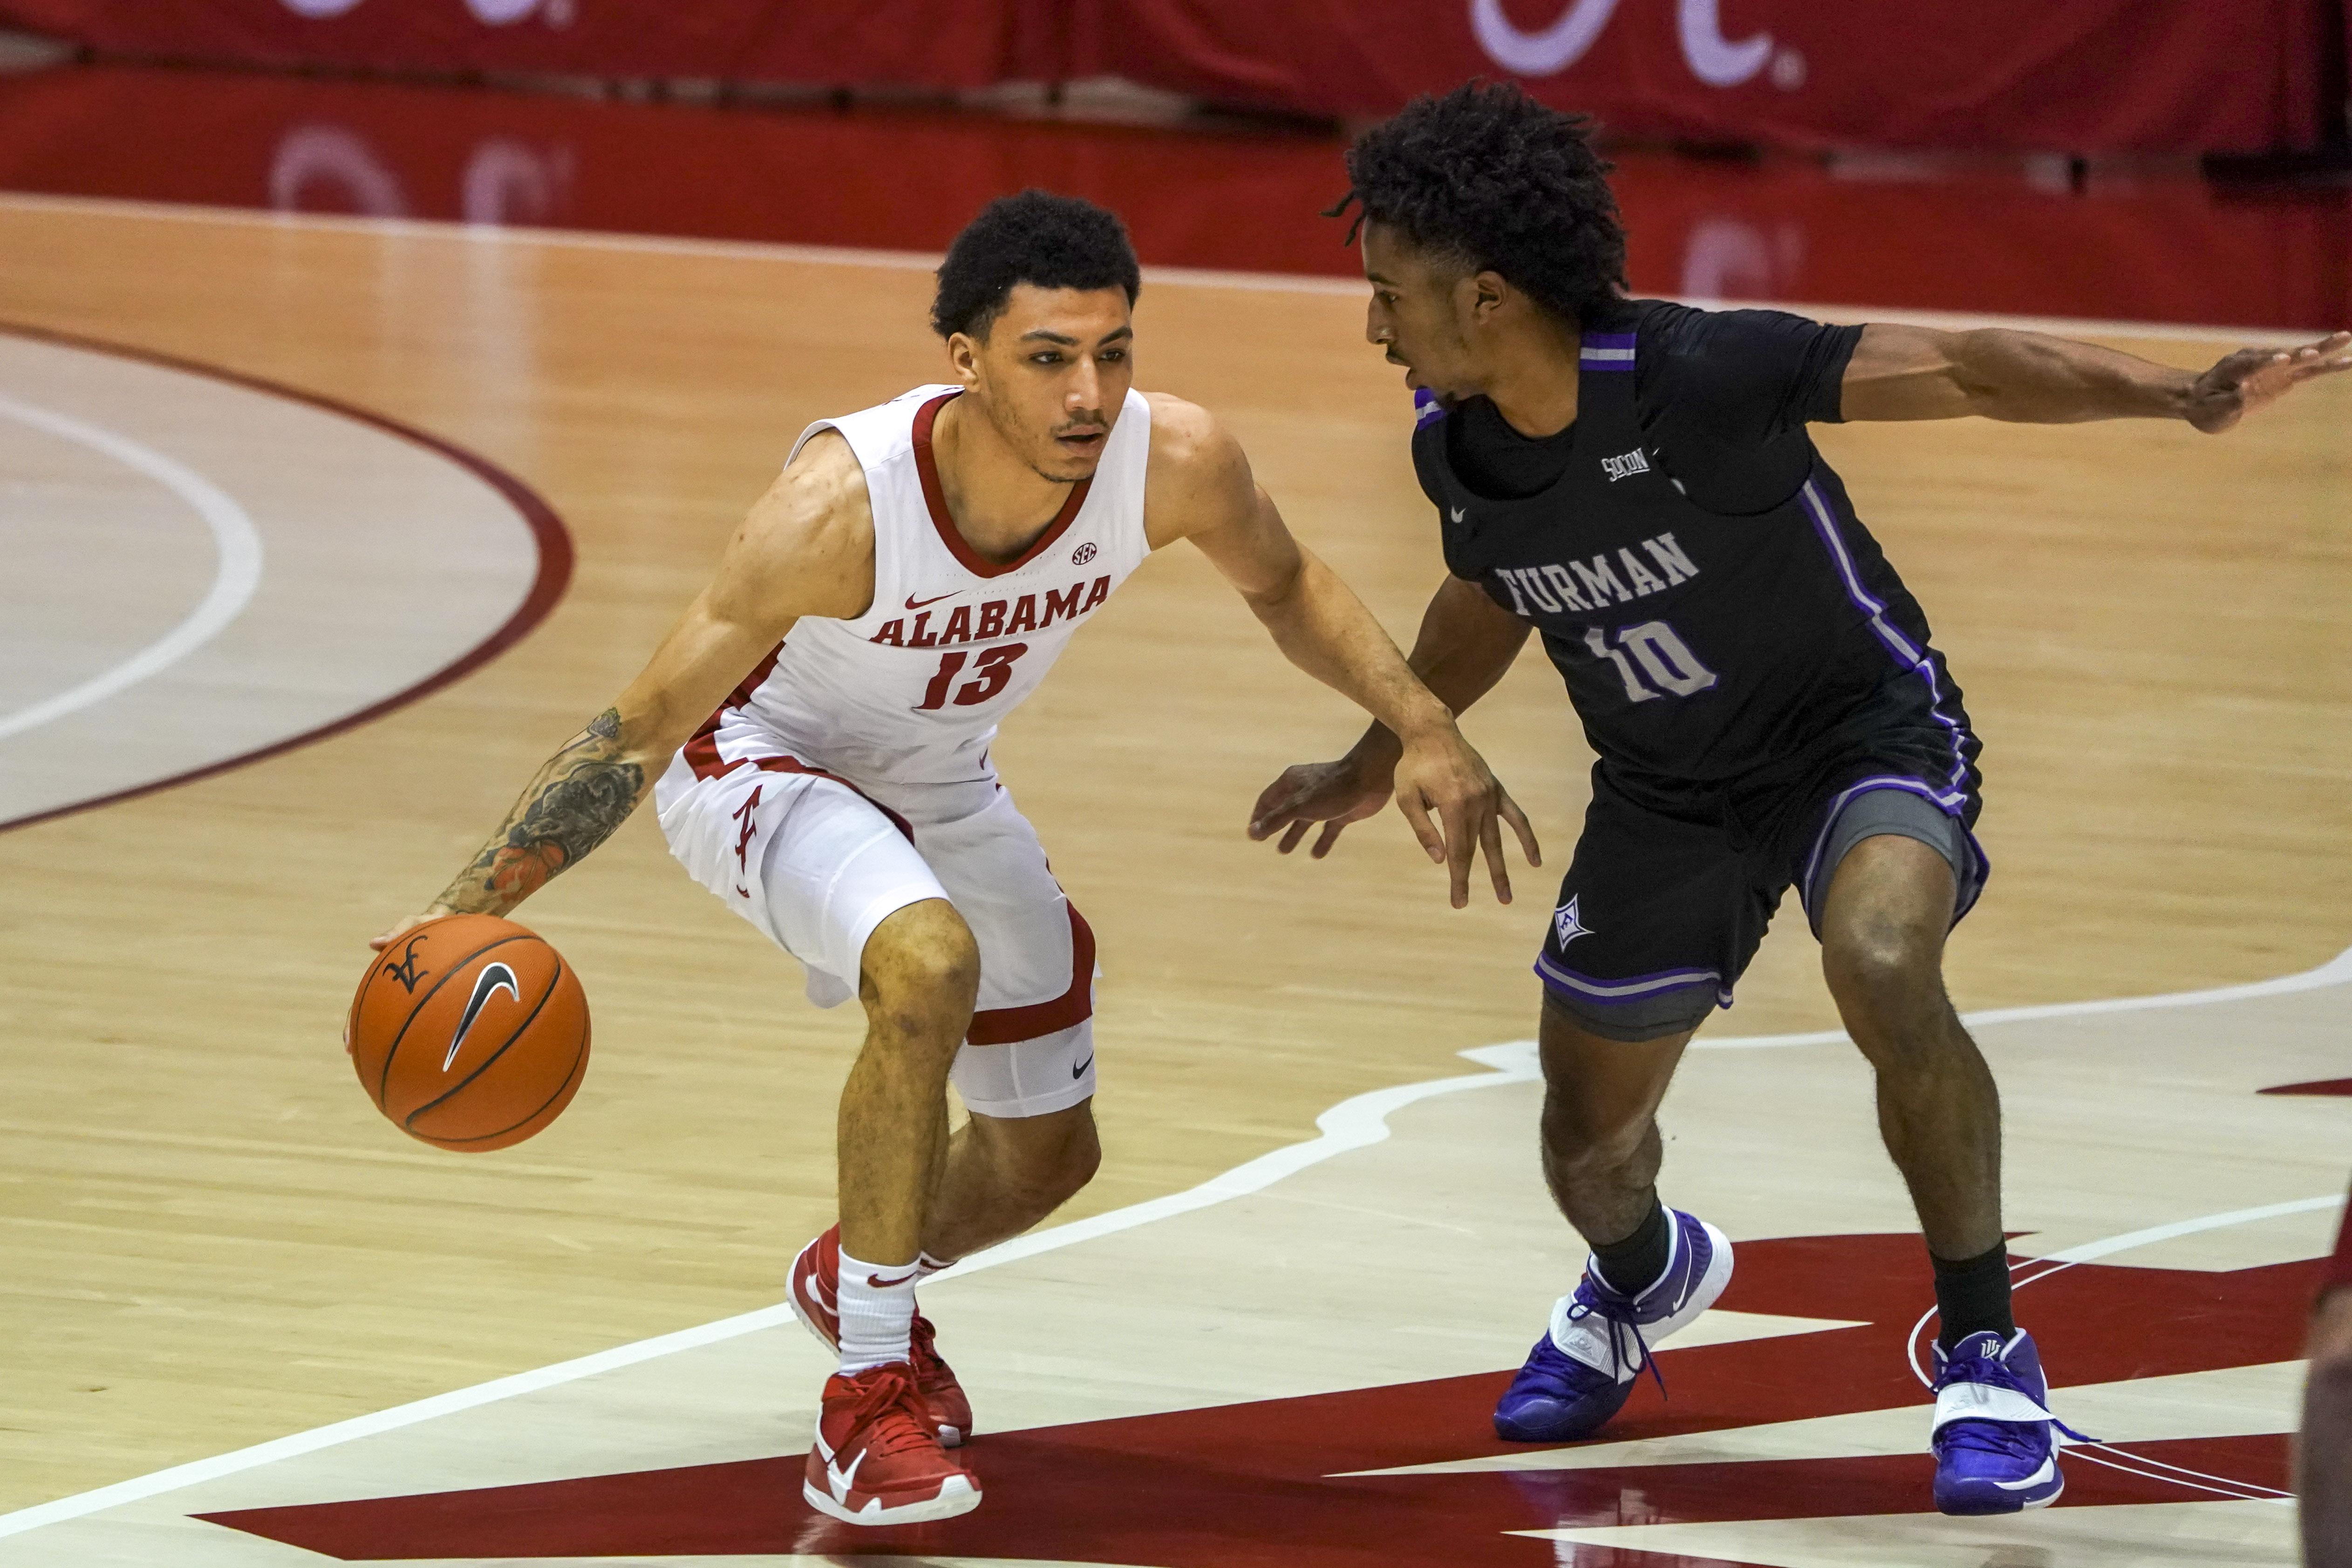 NCAA Basketball: Furman at Alabama